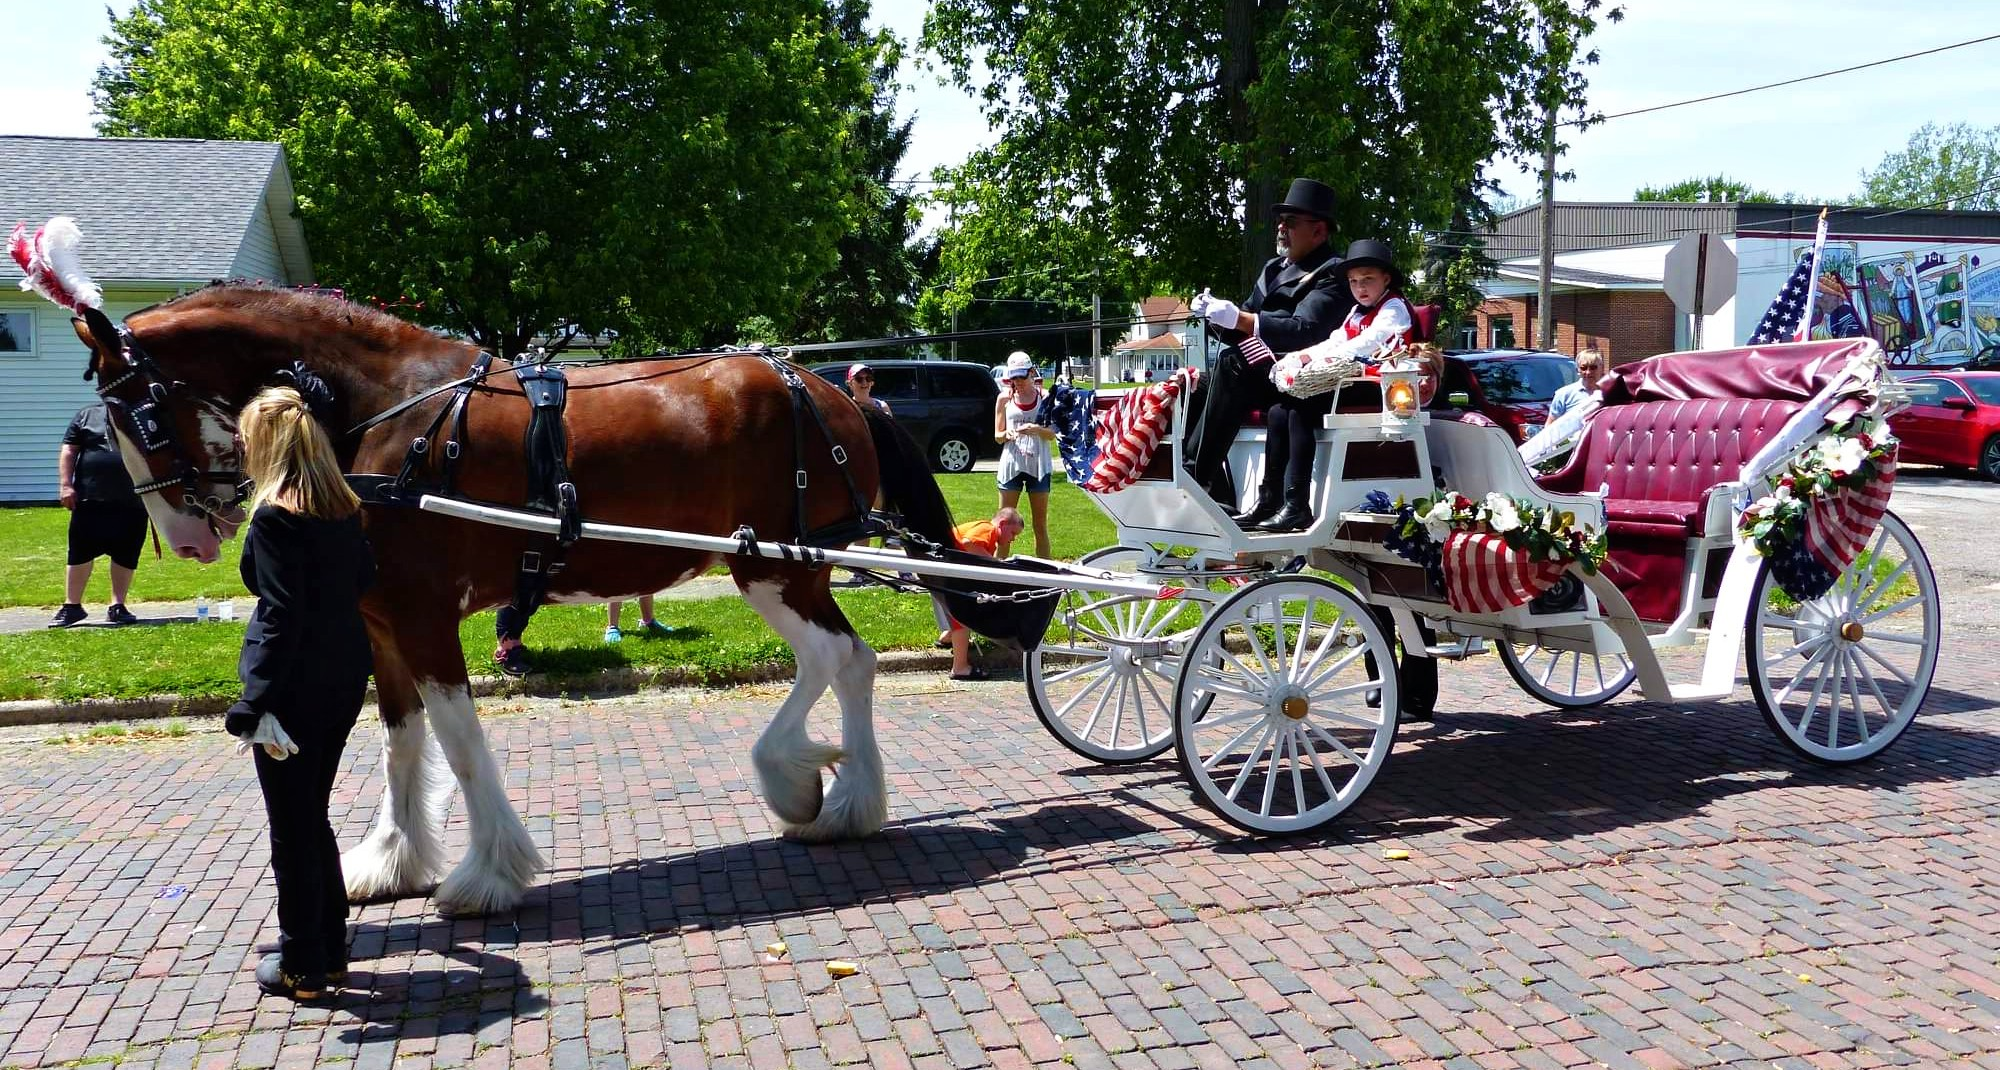 Memorial Day parade, Alger, Ohio